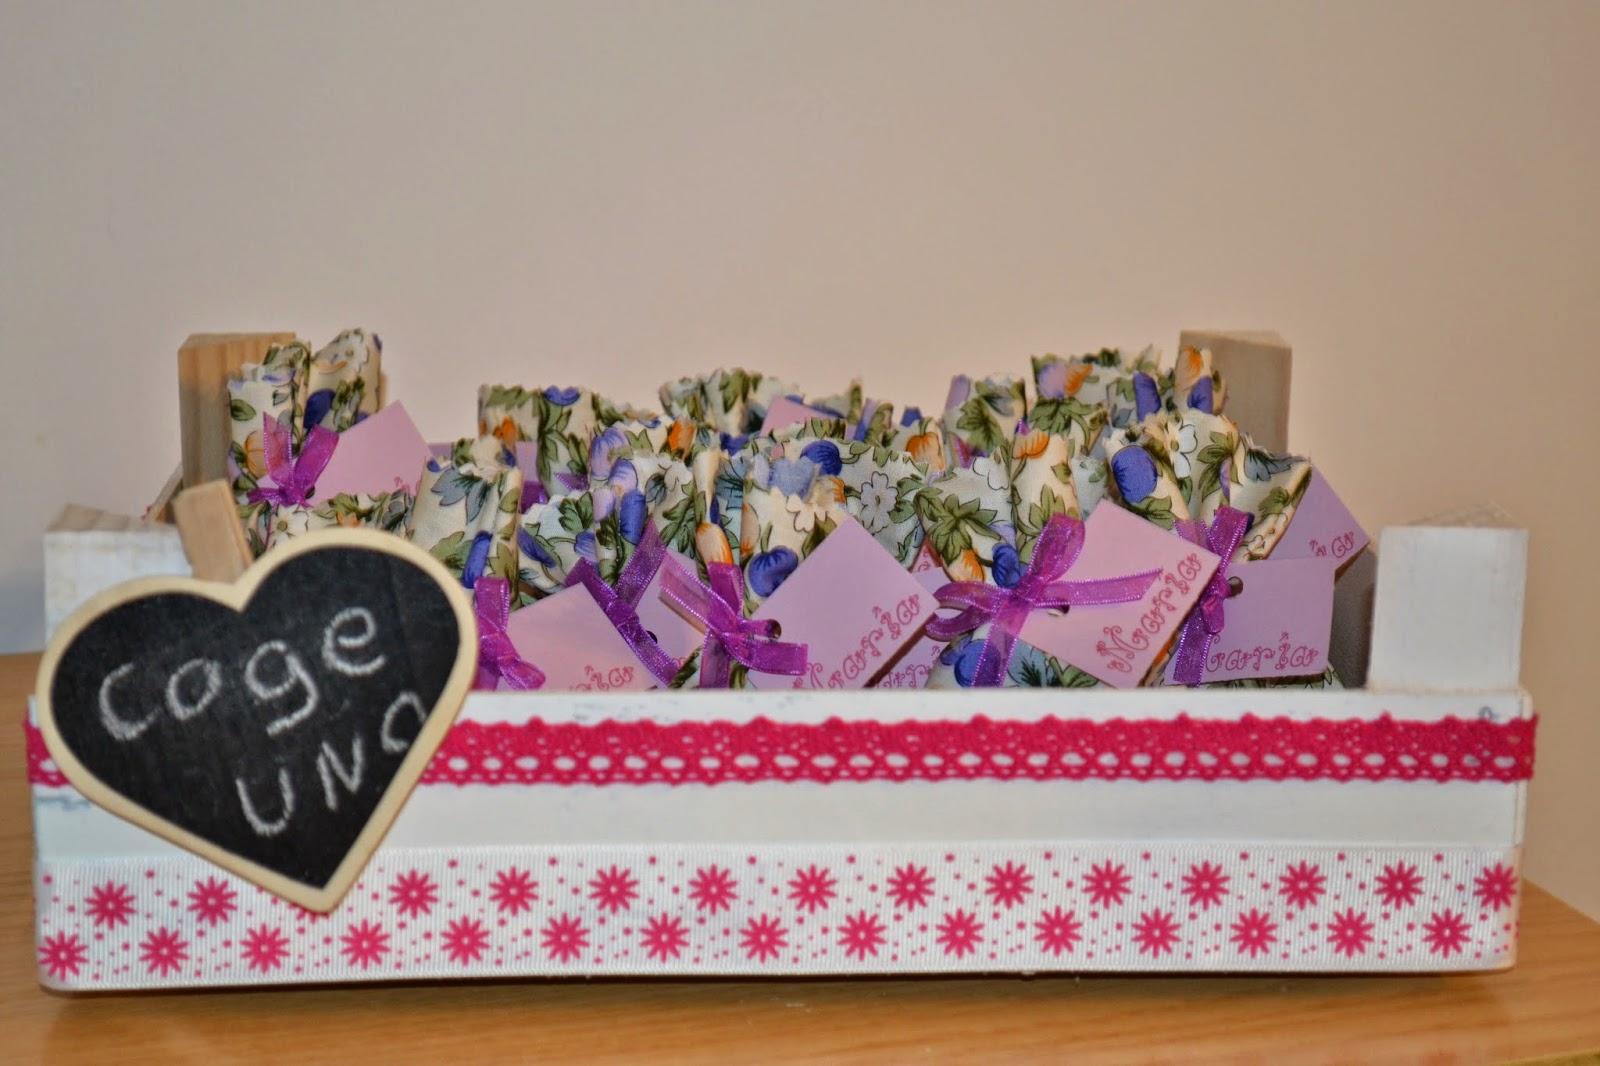 Cajas para bodas caja recuerdos boda caja de recuerdos de boda with cajas para bodas top cajas - Cajitas de madera para decorar ...